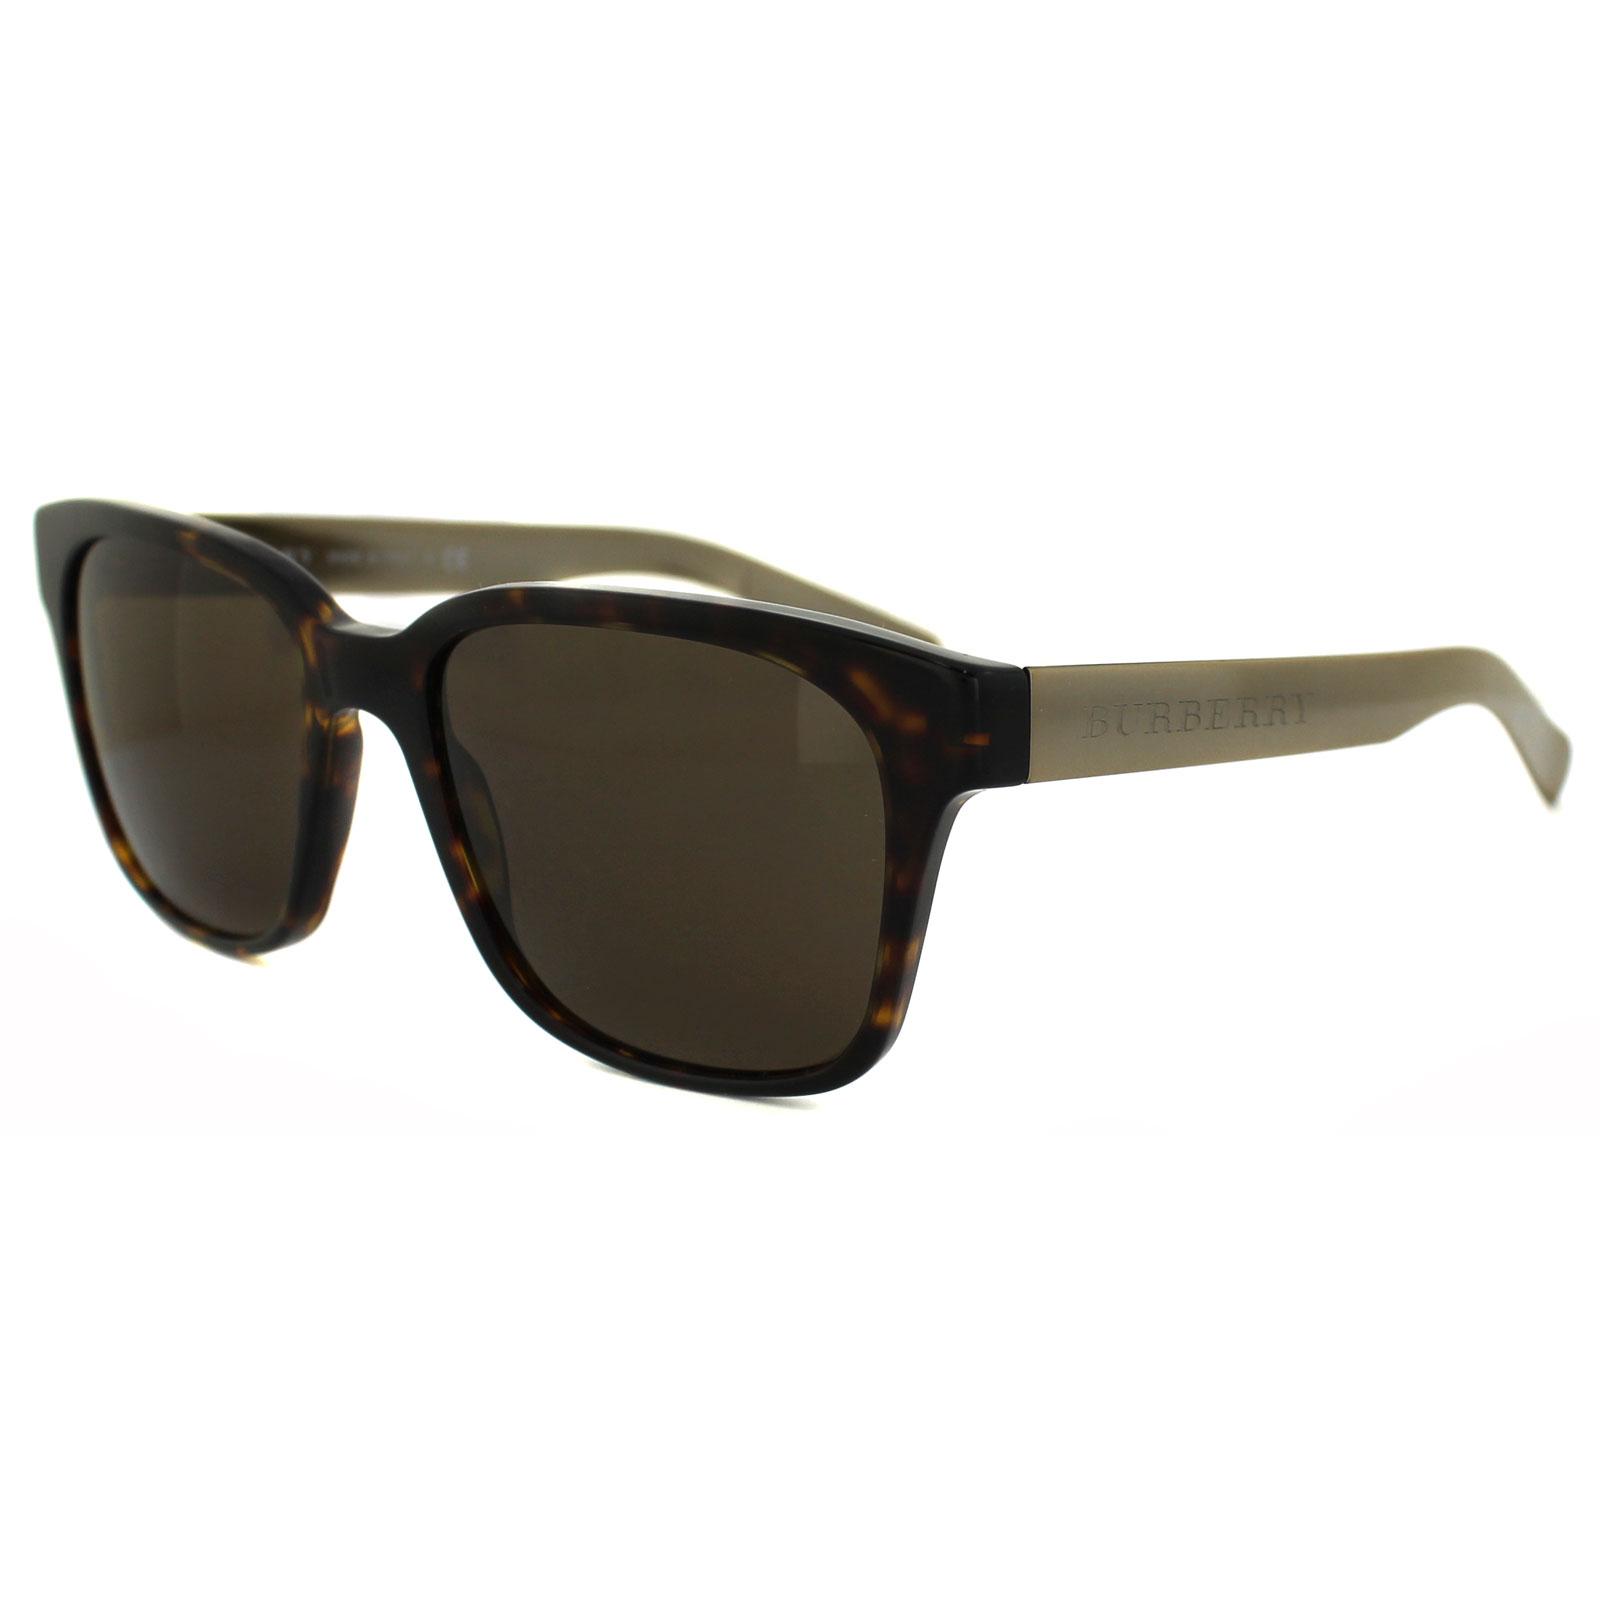 1ae78c6ff3cd Burberry Sunglasses 4148 300273 Tortoise Brown 8053672121421